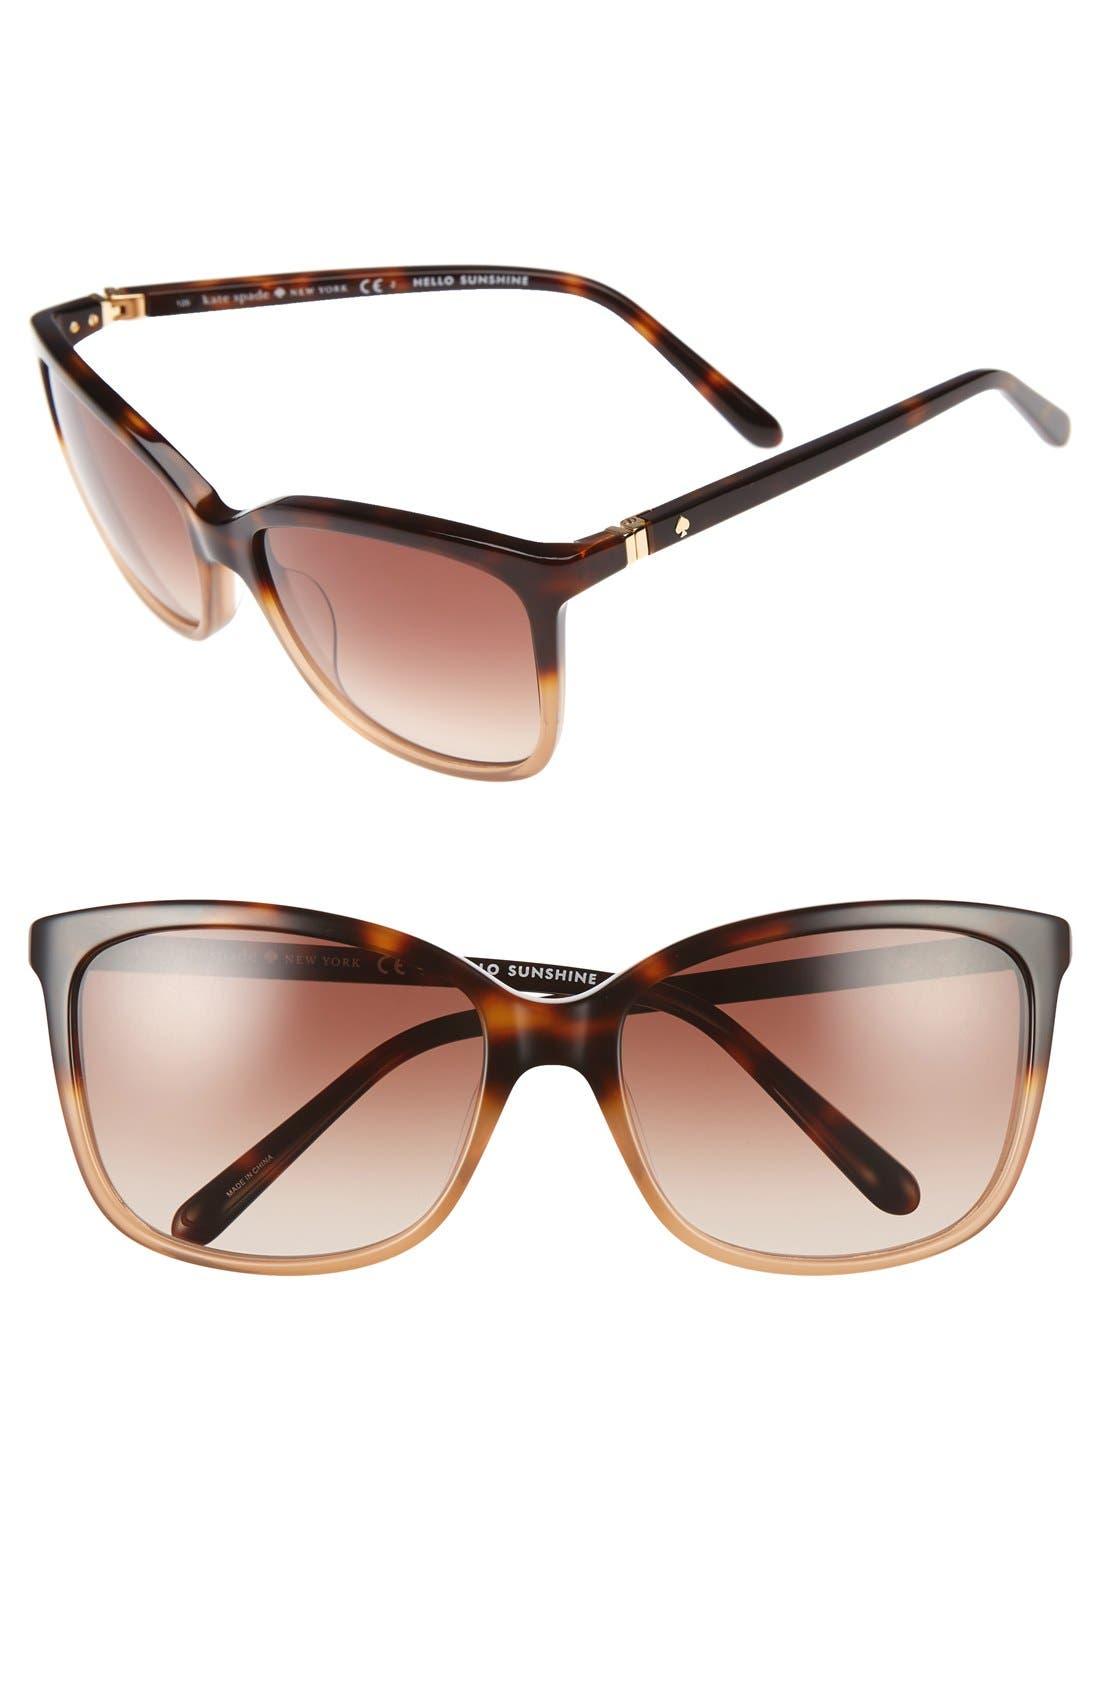 Main Image - kate spade new york kasie 55mm cat eye sunglasses